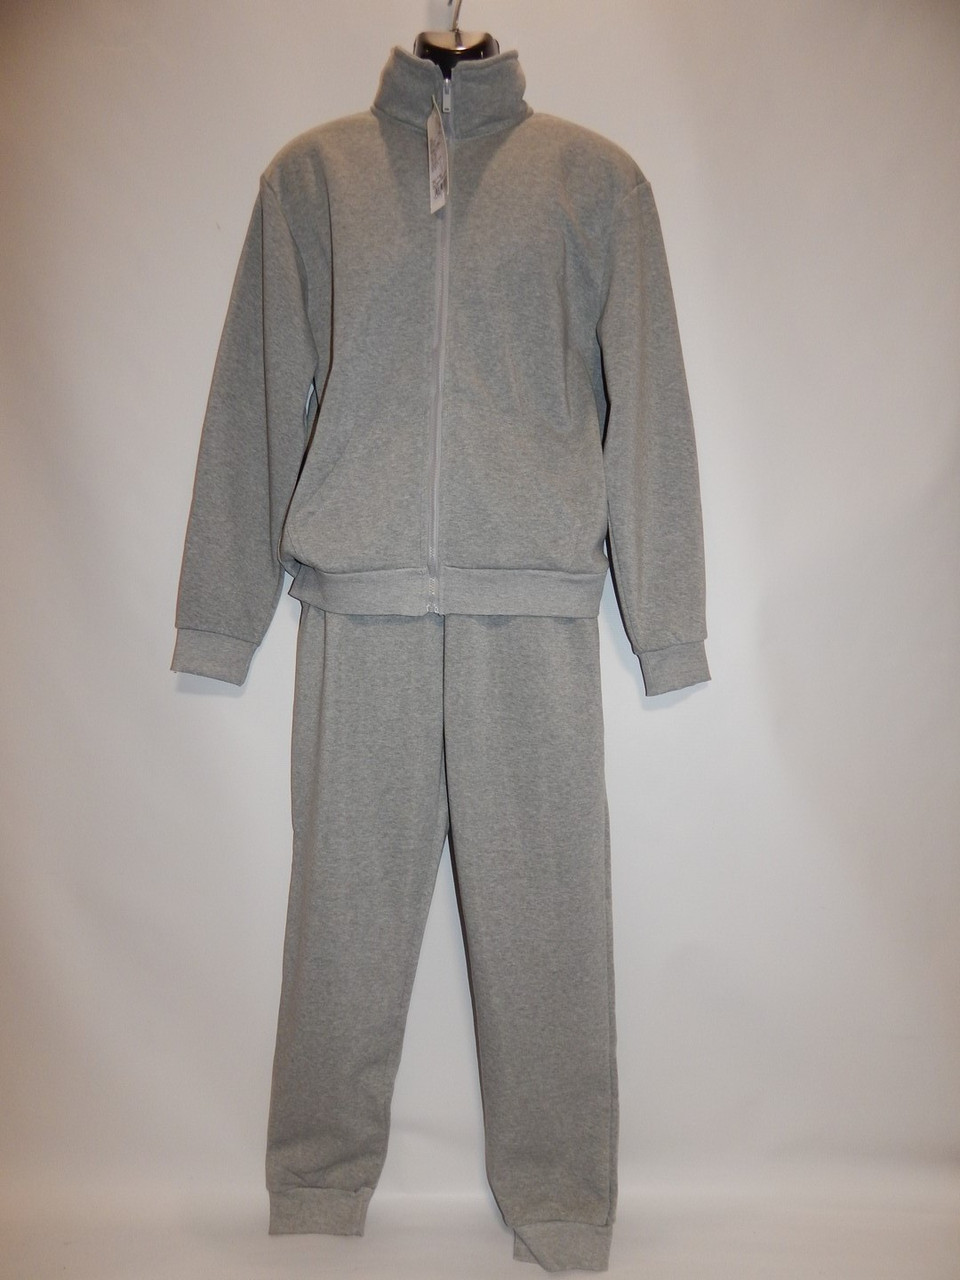 Теплый мужской спортивный костюм  B. Men р.52 016TMK